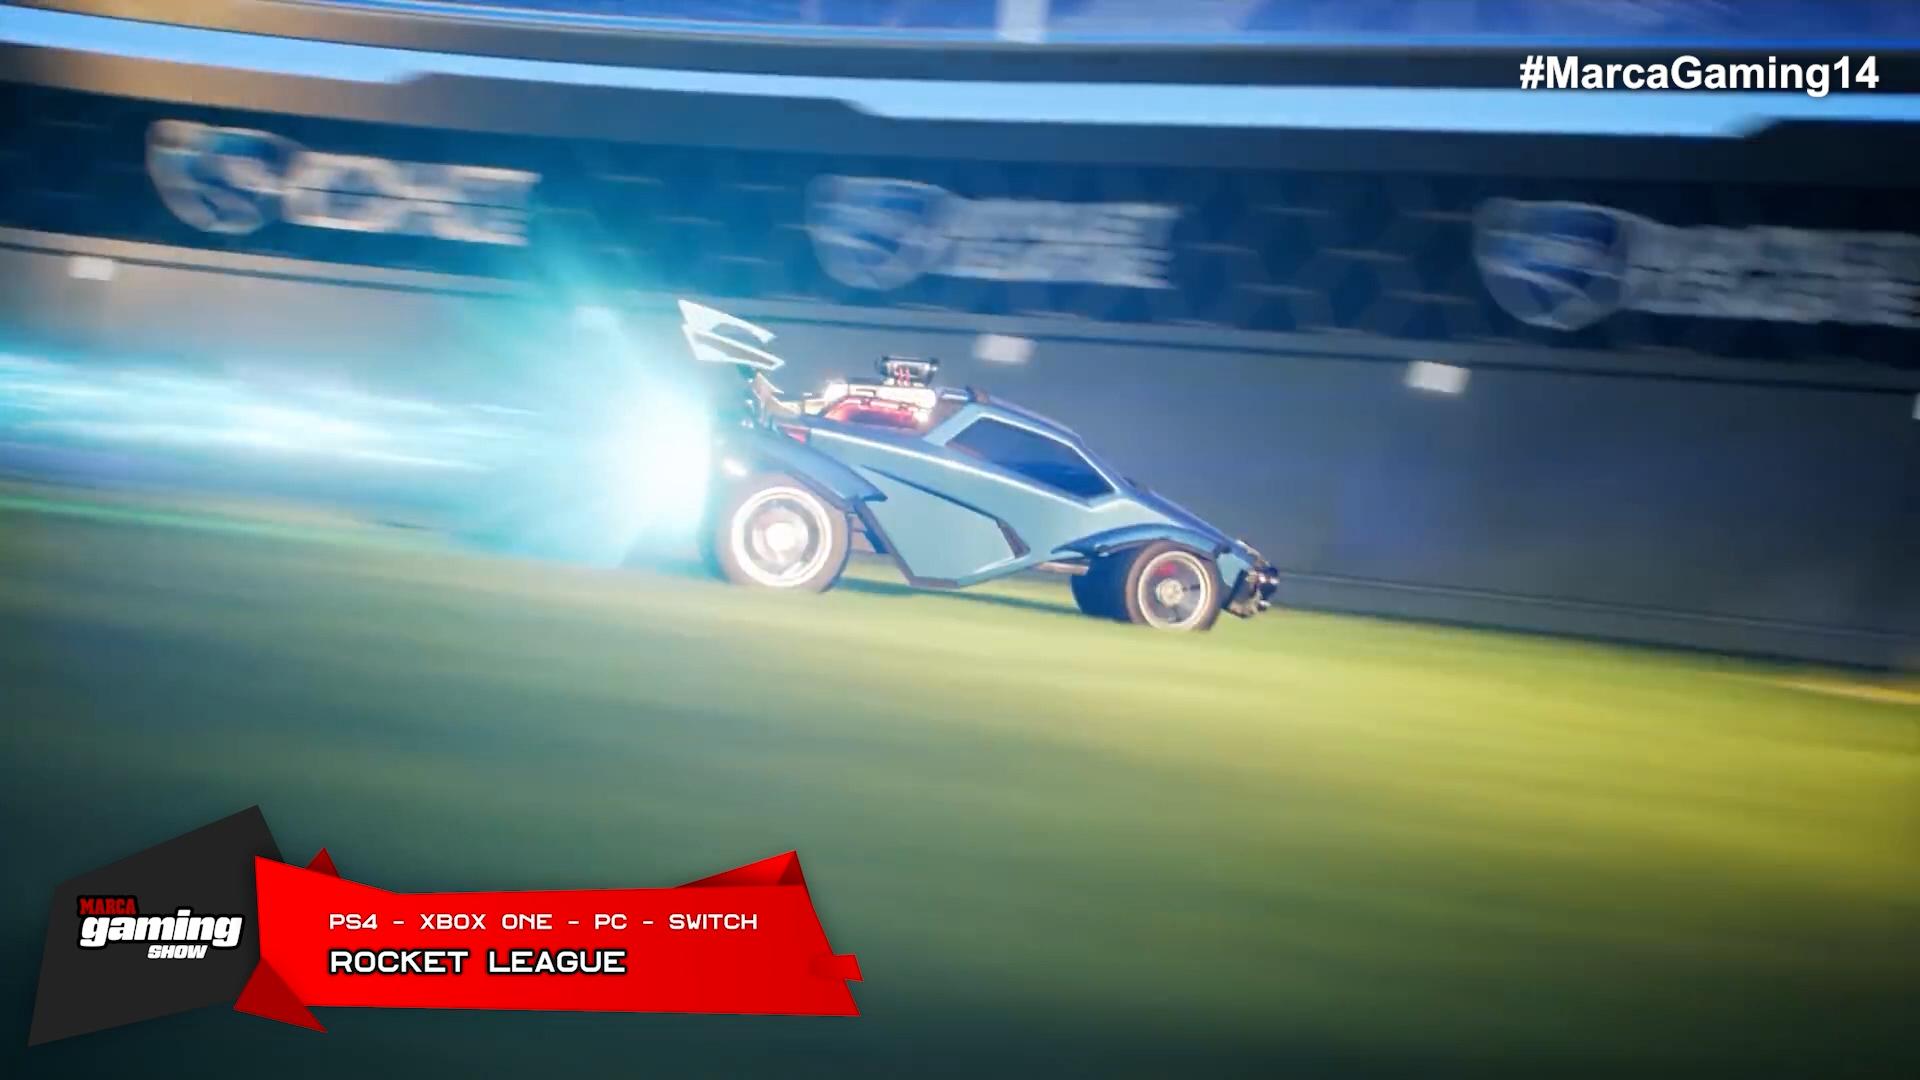 Rocket League (PC - PS4 - XBOX ONE - XBOX SERIES - SWITCH)